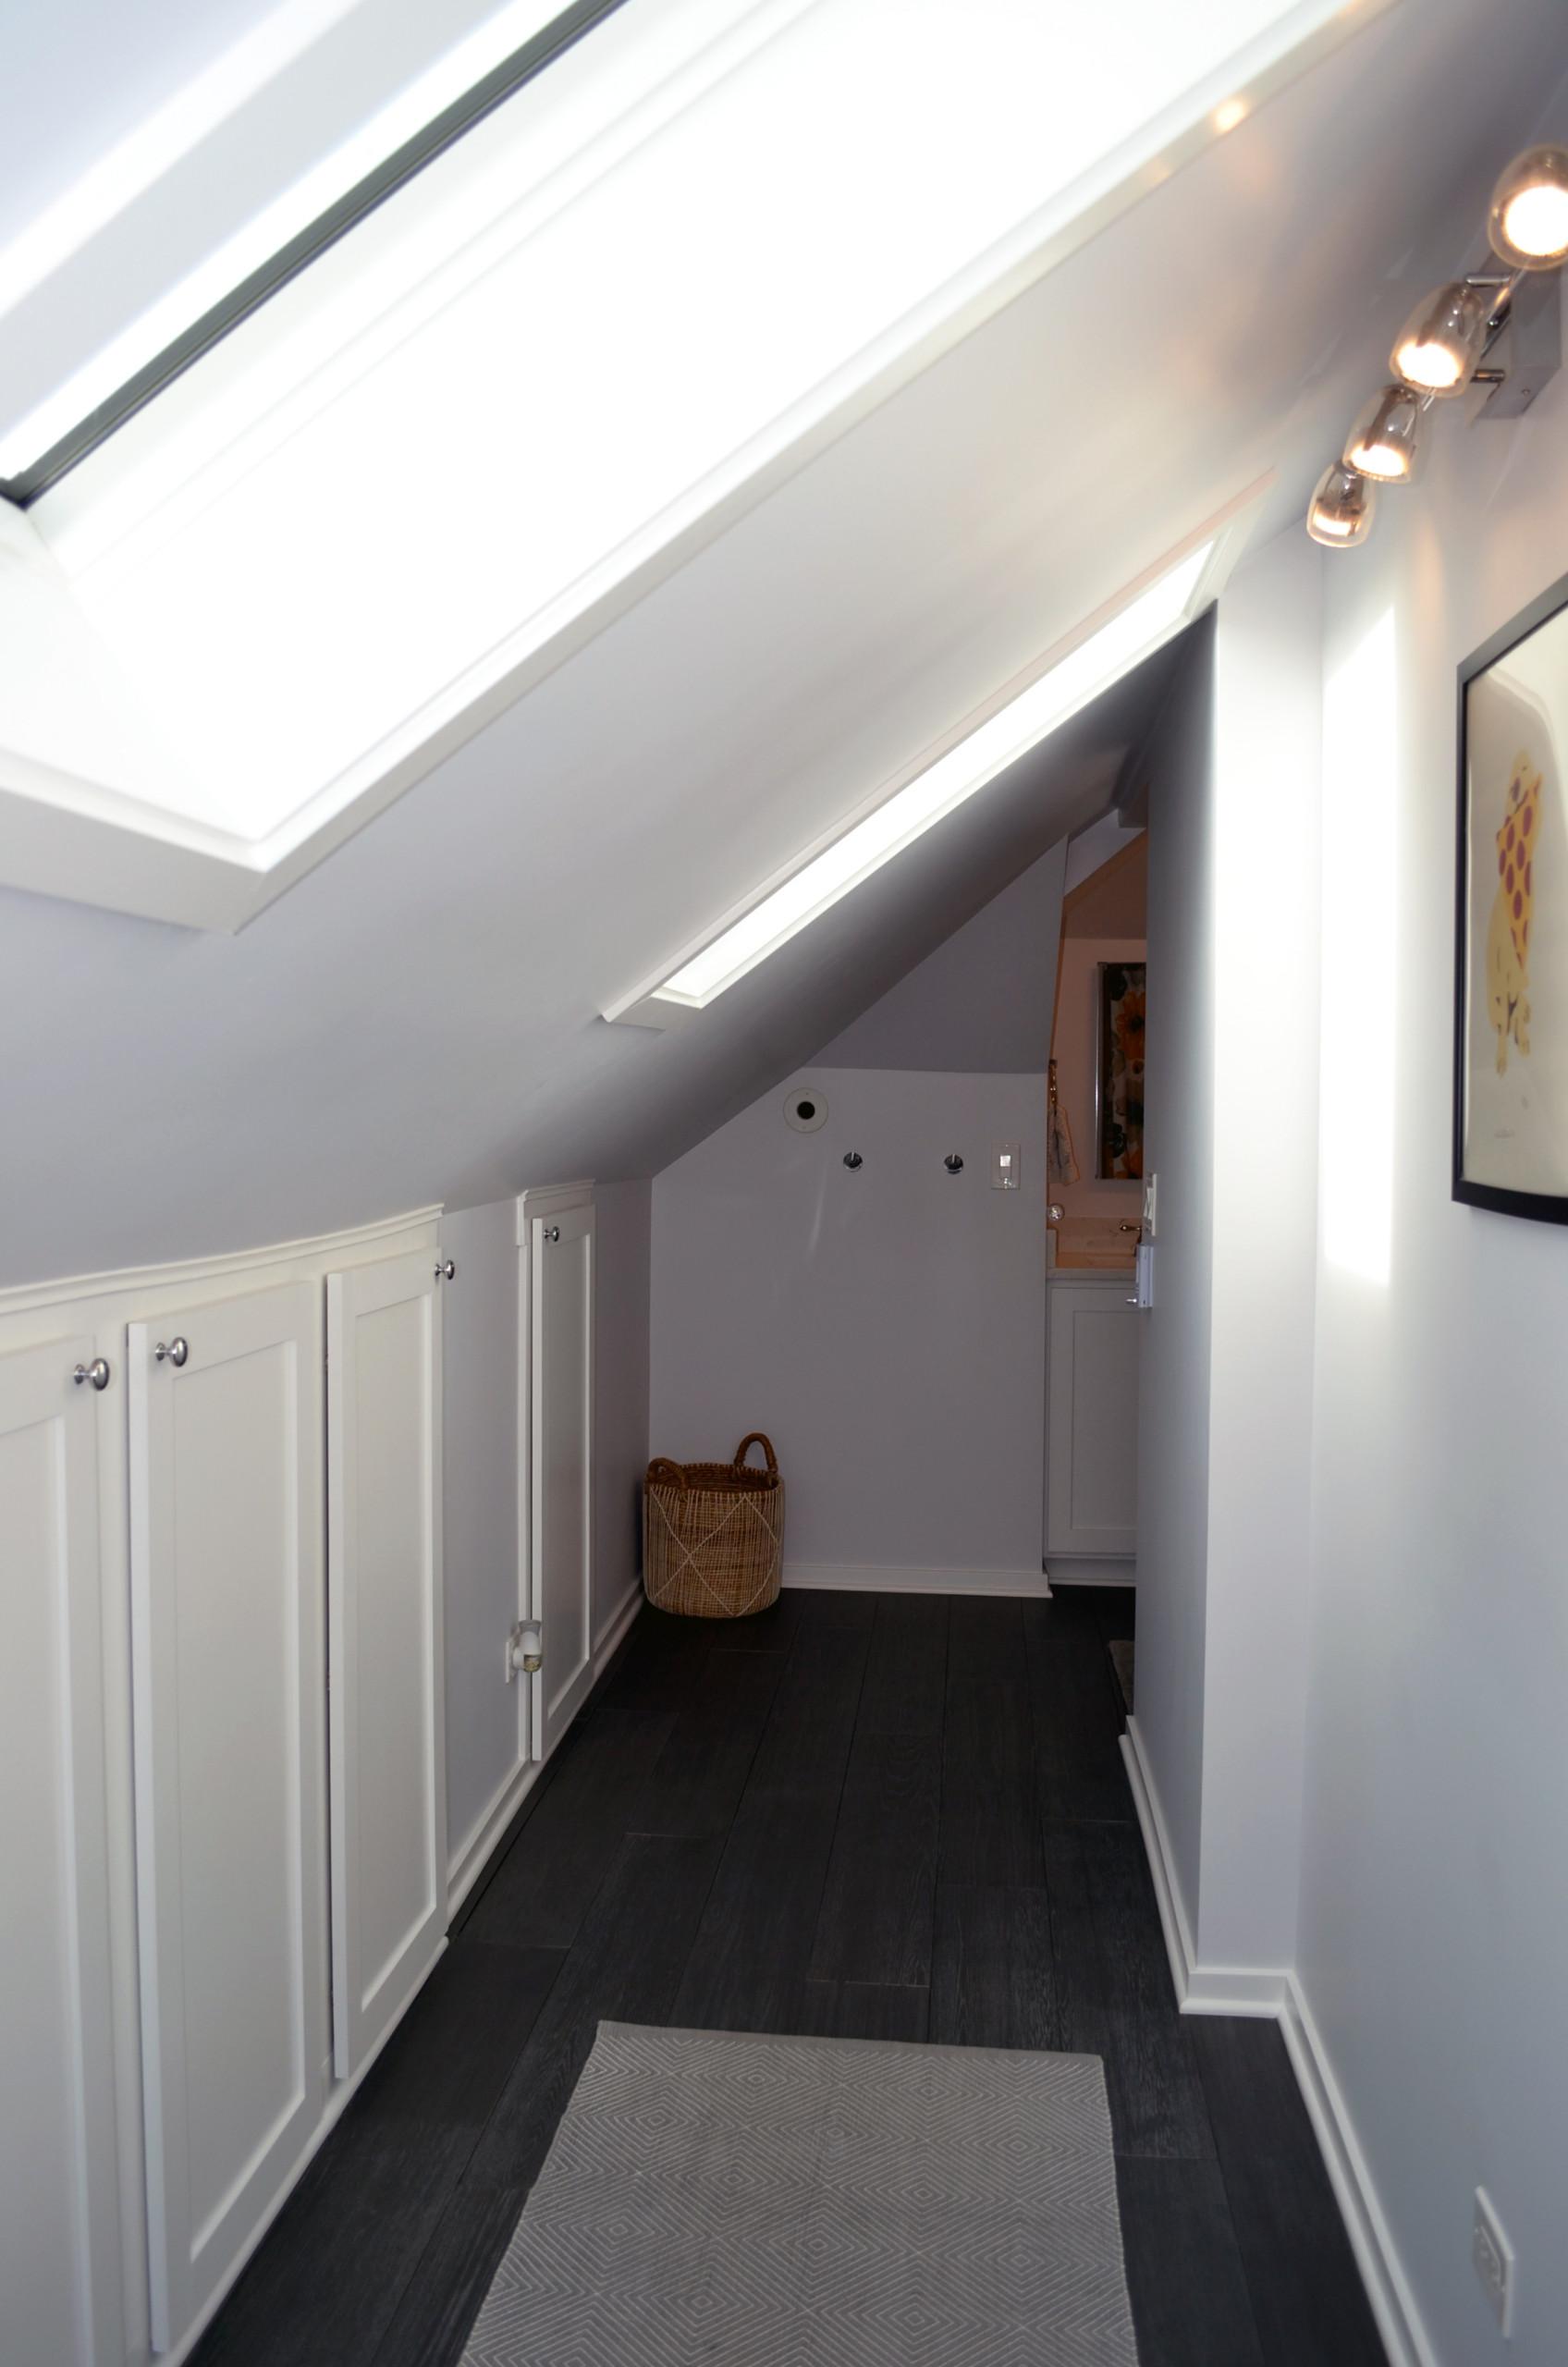 Skokie - Bathroom reconfiguration